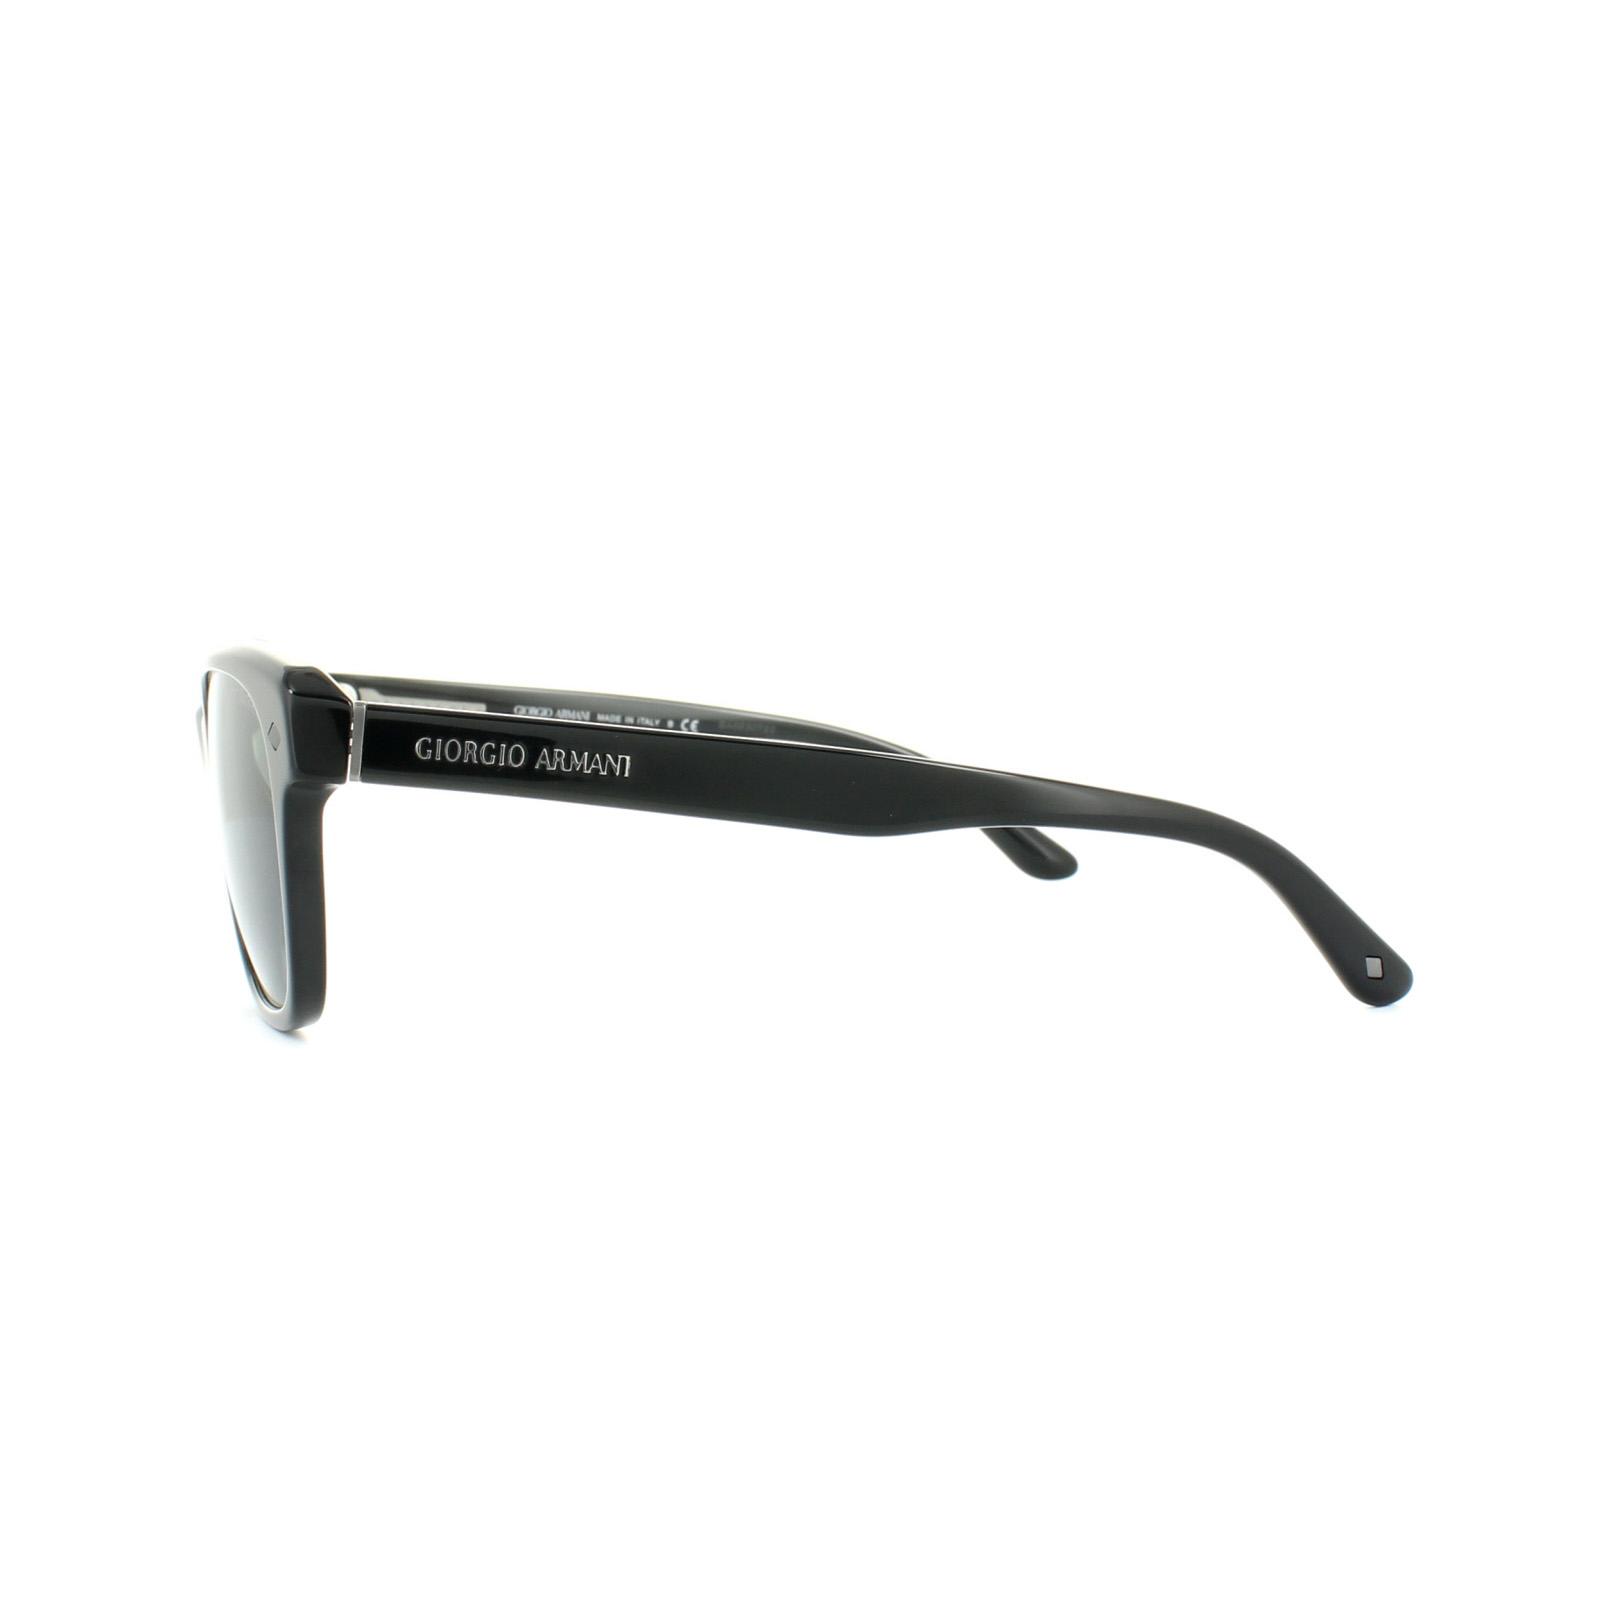 b9acd3dbd7f6 Sentinel Thumbnail 2. Sentinel Giorgio Armani Sunglasses AR8067 5017R5  Black Grey. Sentinel Thumbnail 3